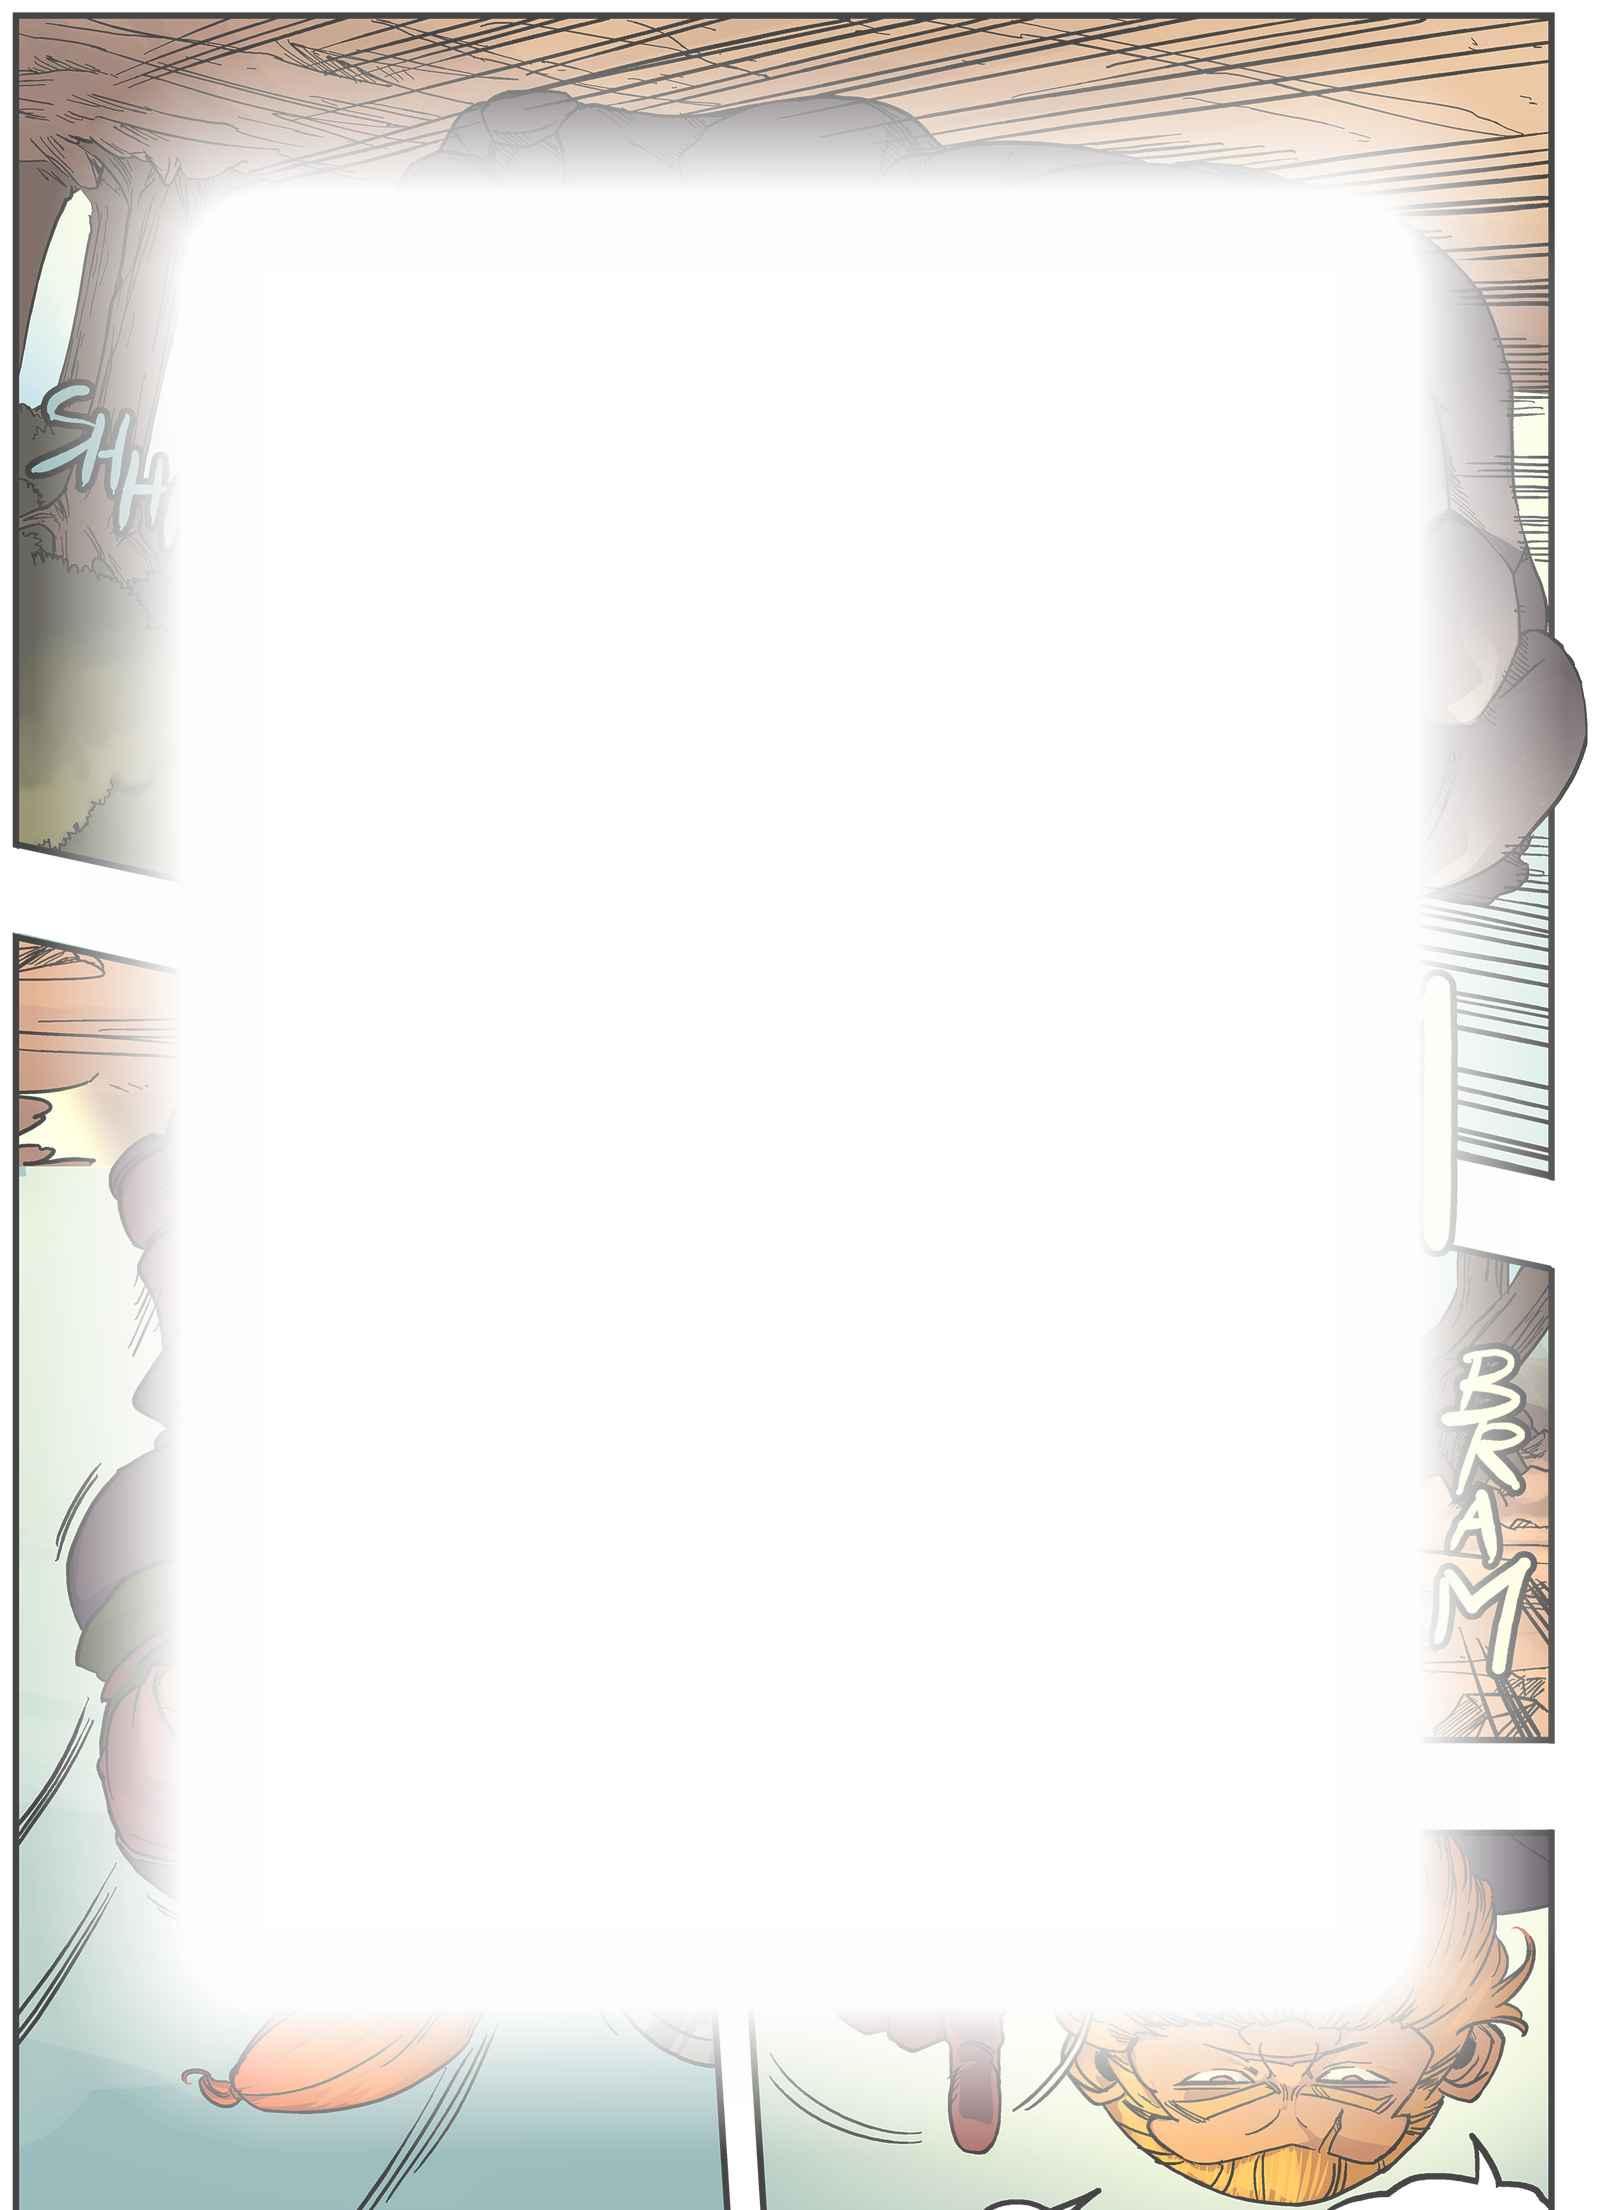 Hemispheres : チャプター 10 ページ 20